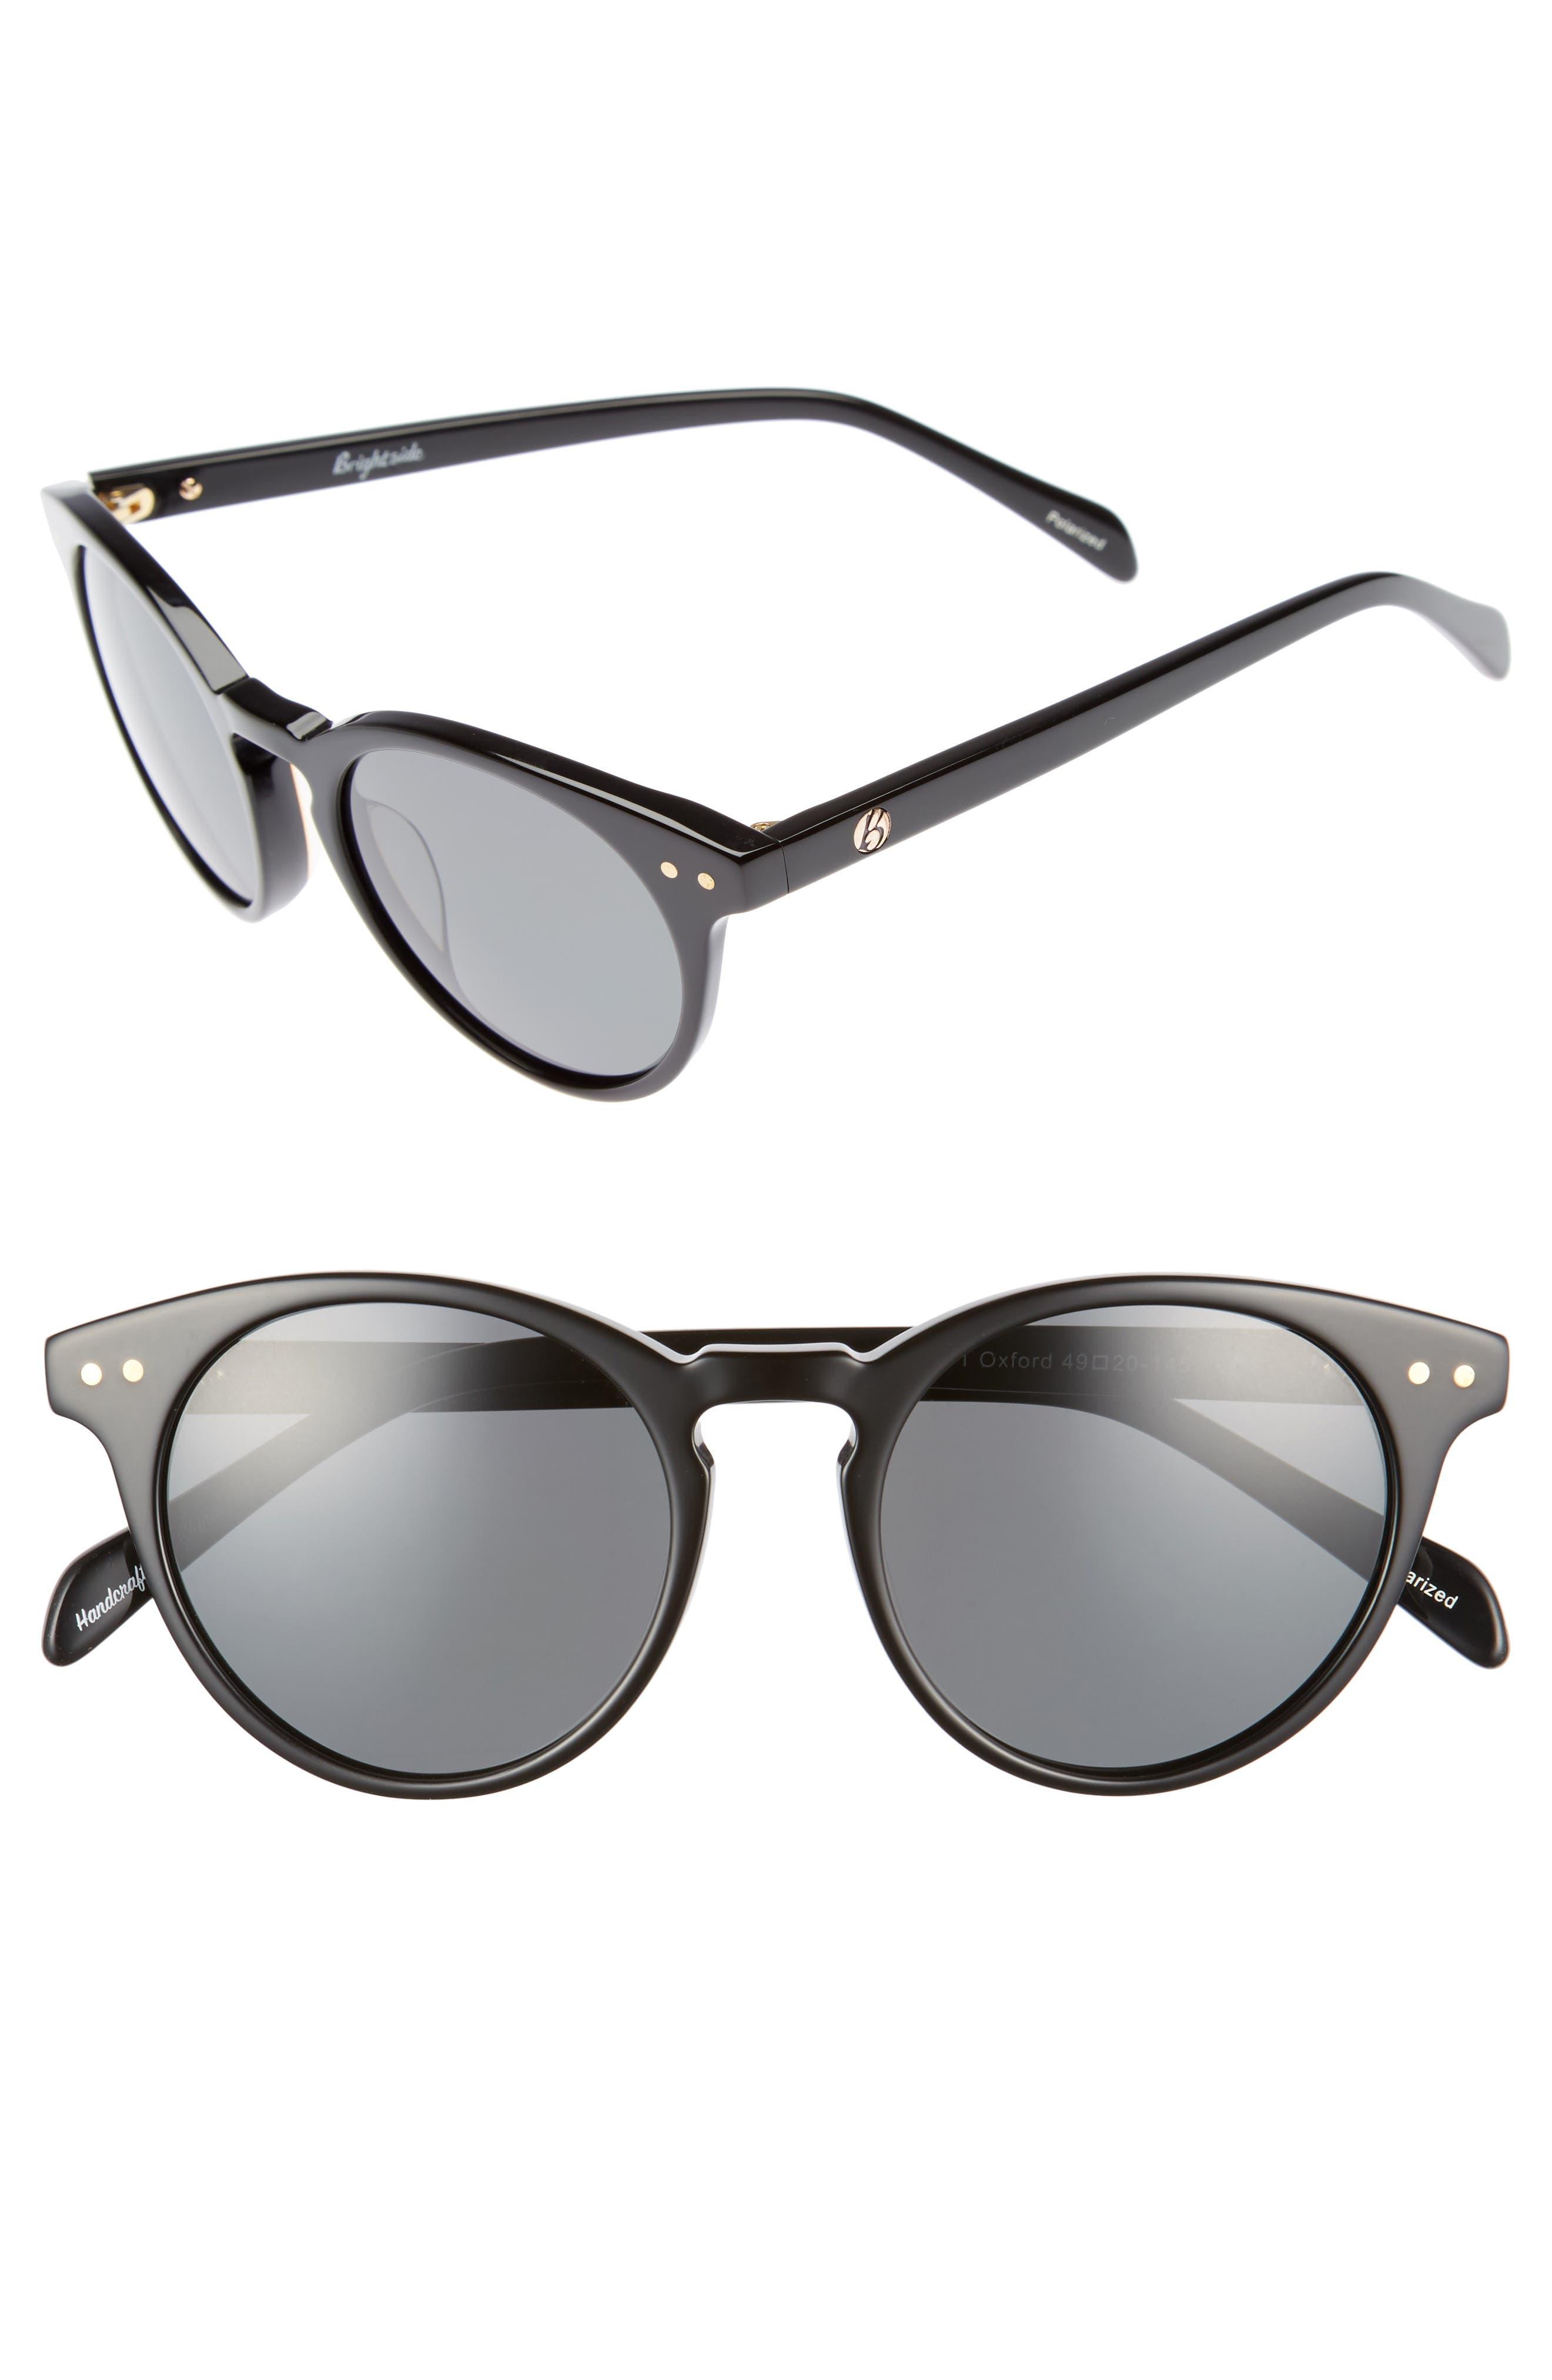 Brightside Oxford 49mm Polarized Sunglasses